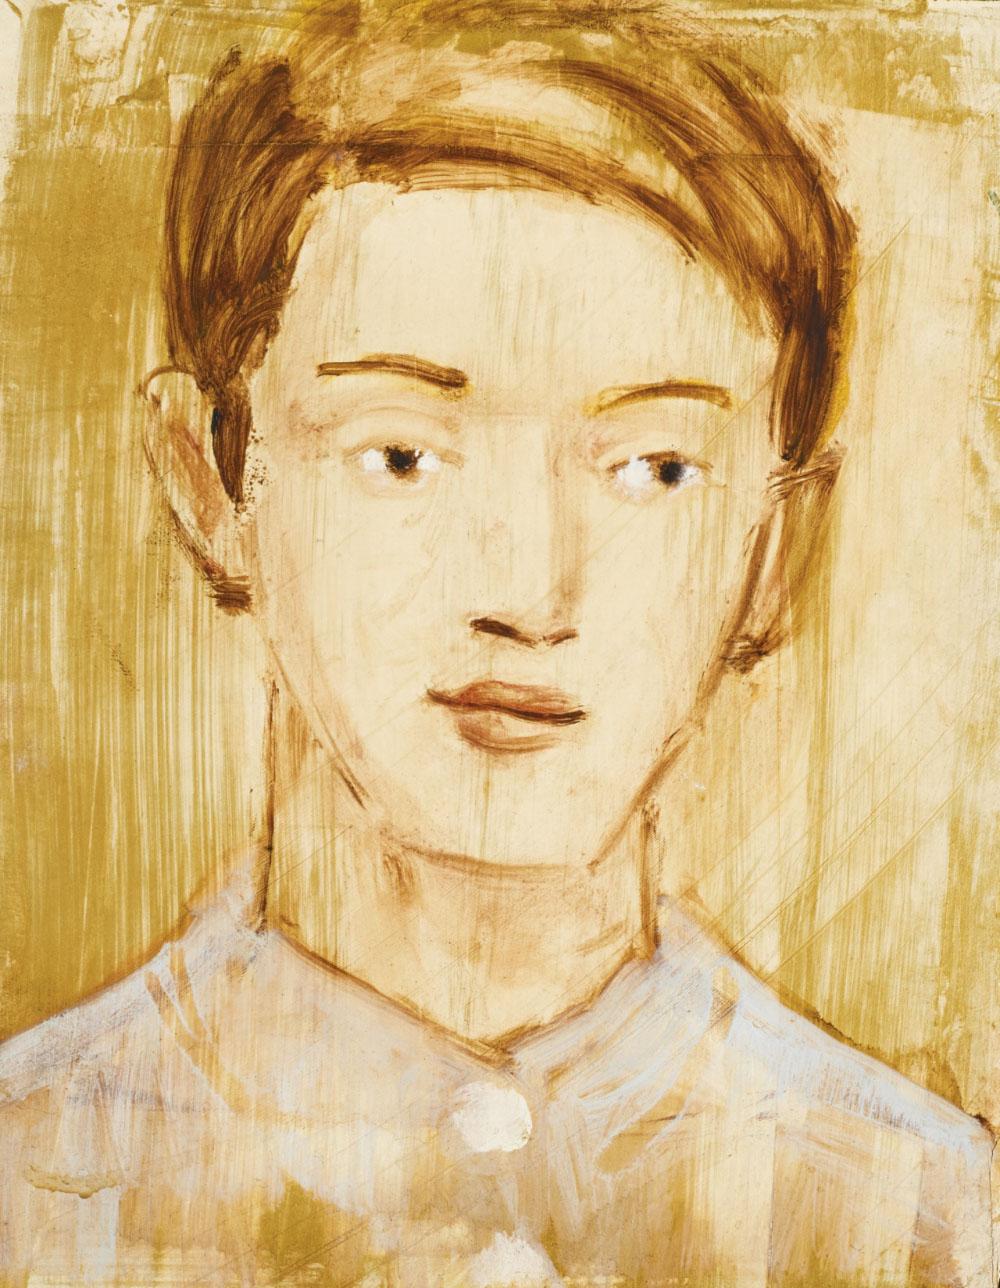 Untitled, 1992